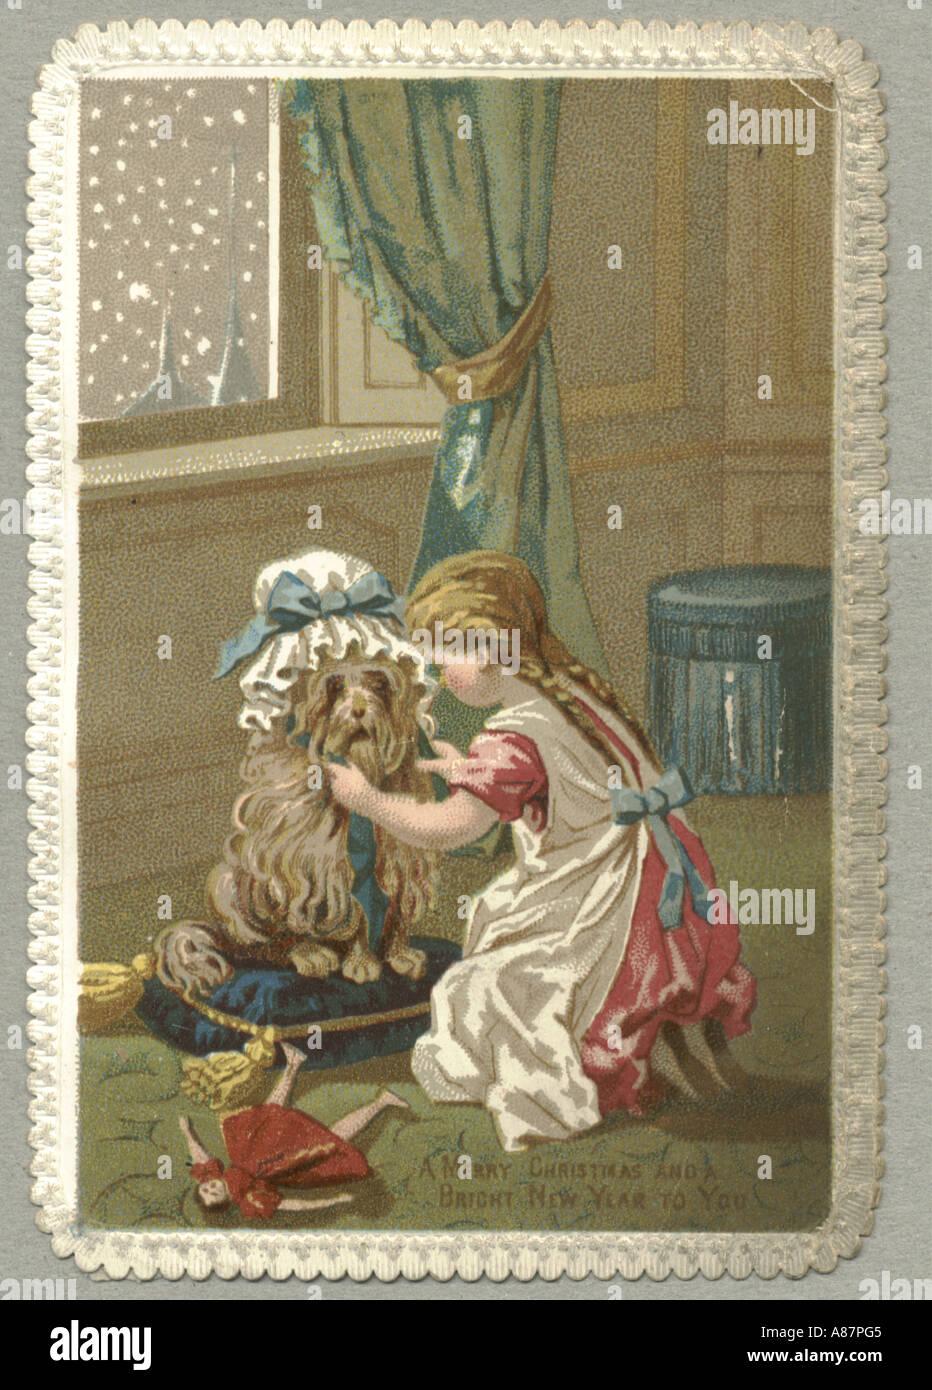 Christmas Greeting Card Of Child With Dog Circa 1870 Stock Photo